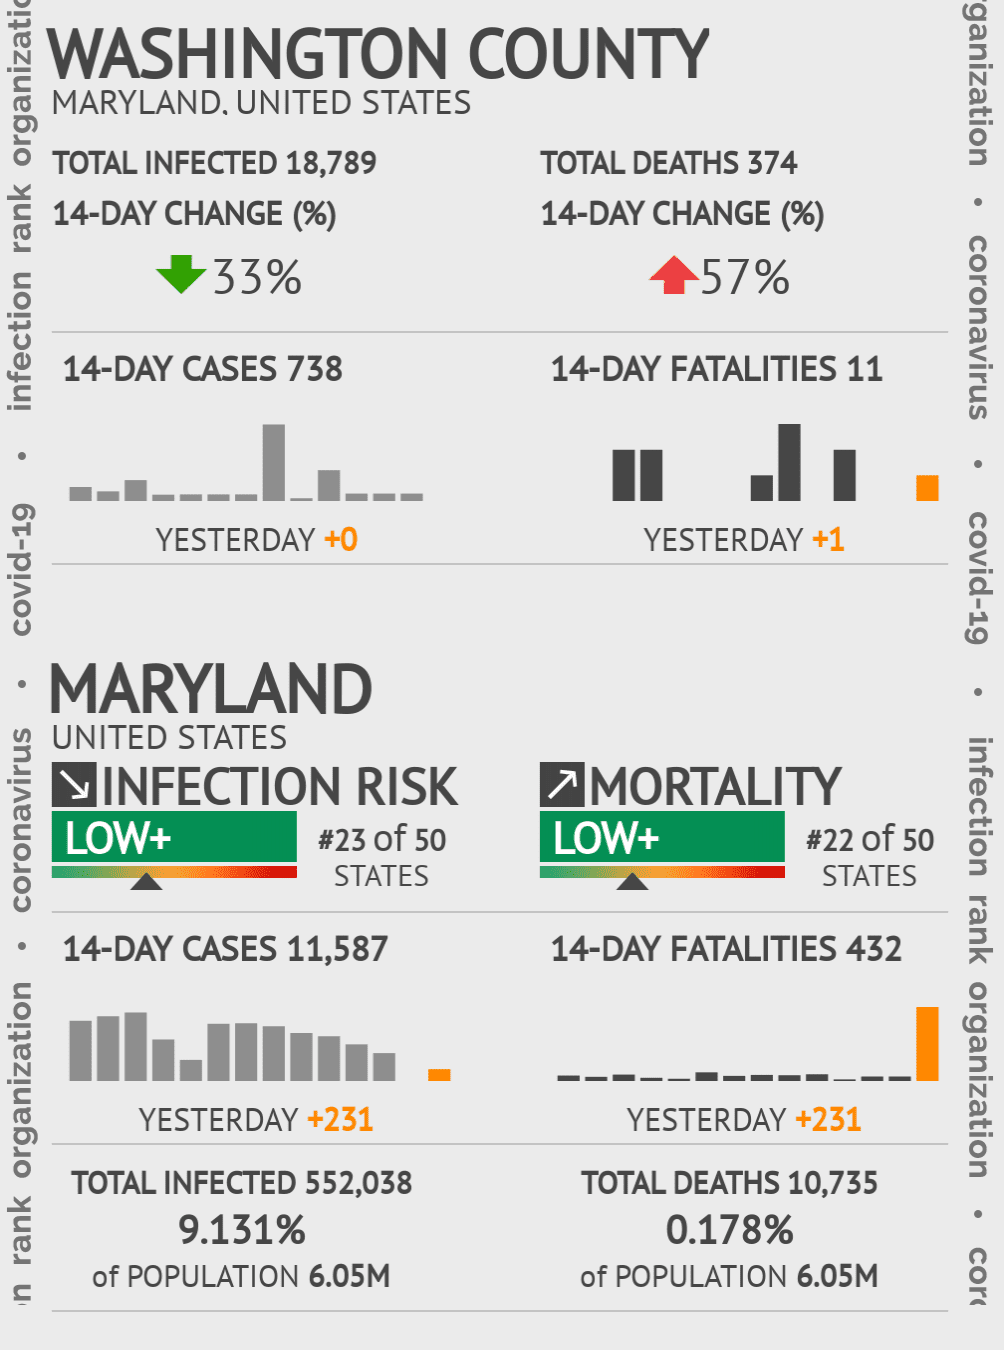 Washington County Coronavirus Covid-19 Risk of Infection on March 23, 2021